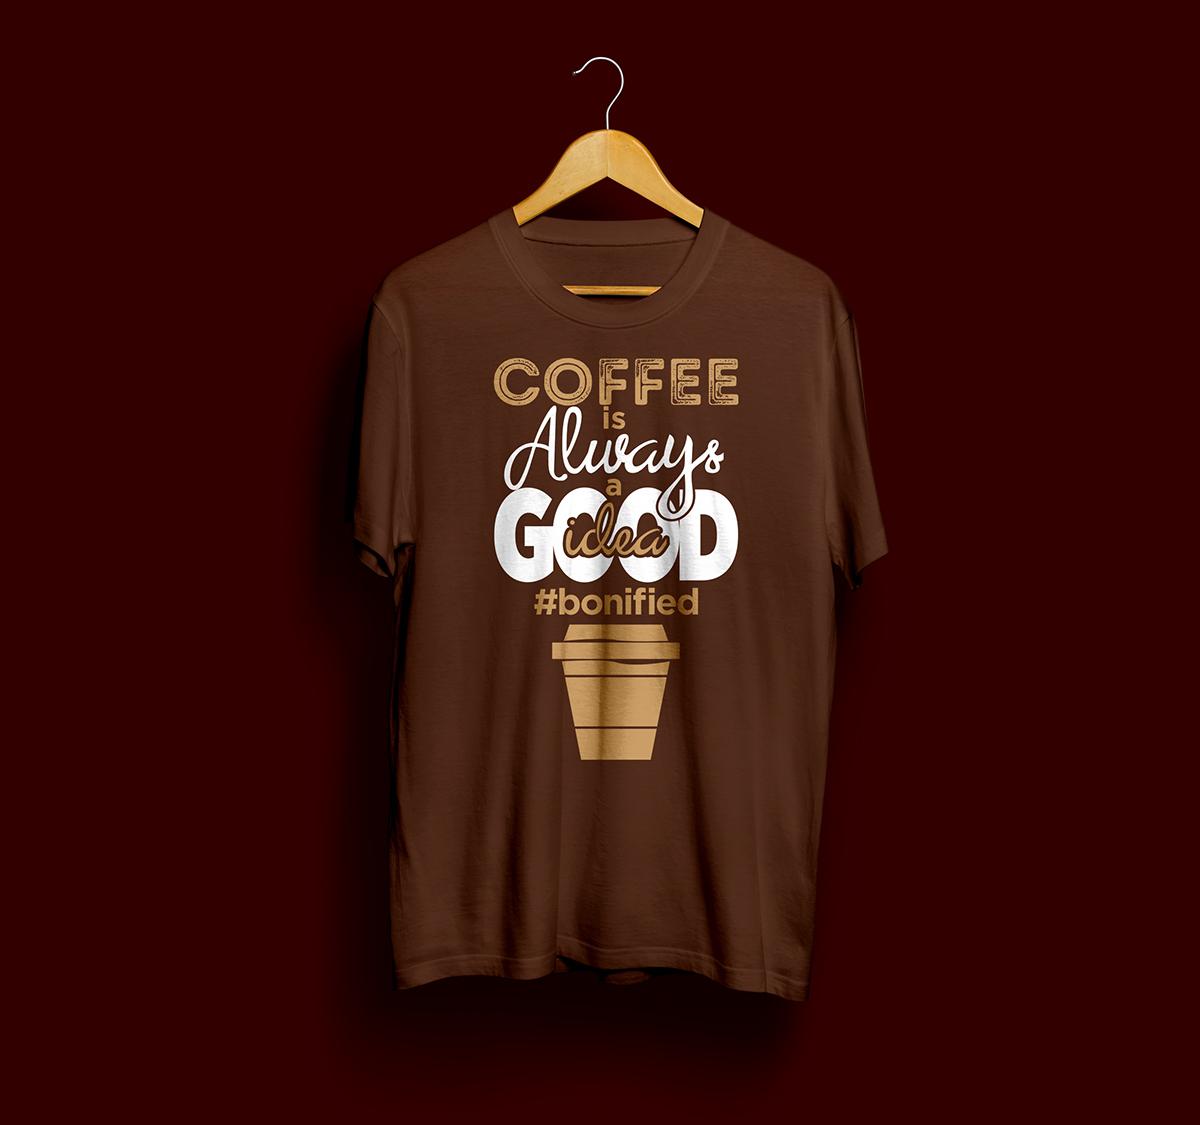 BoniCafe,coffee shop,tshirt,silk screen